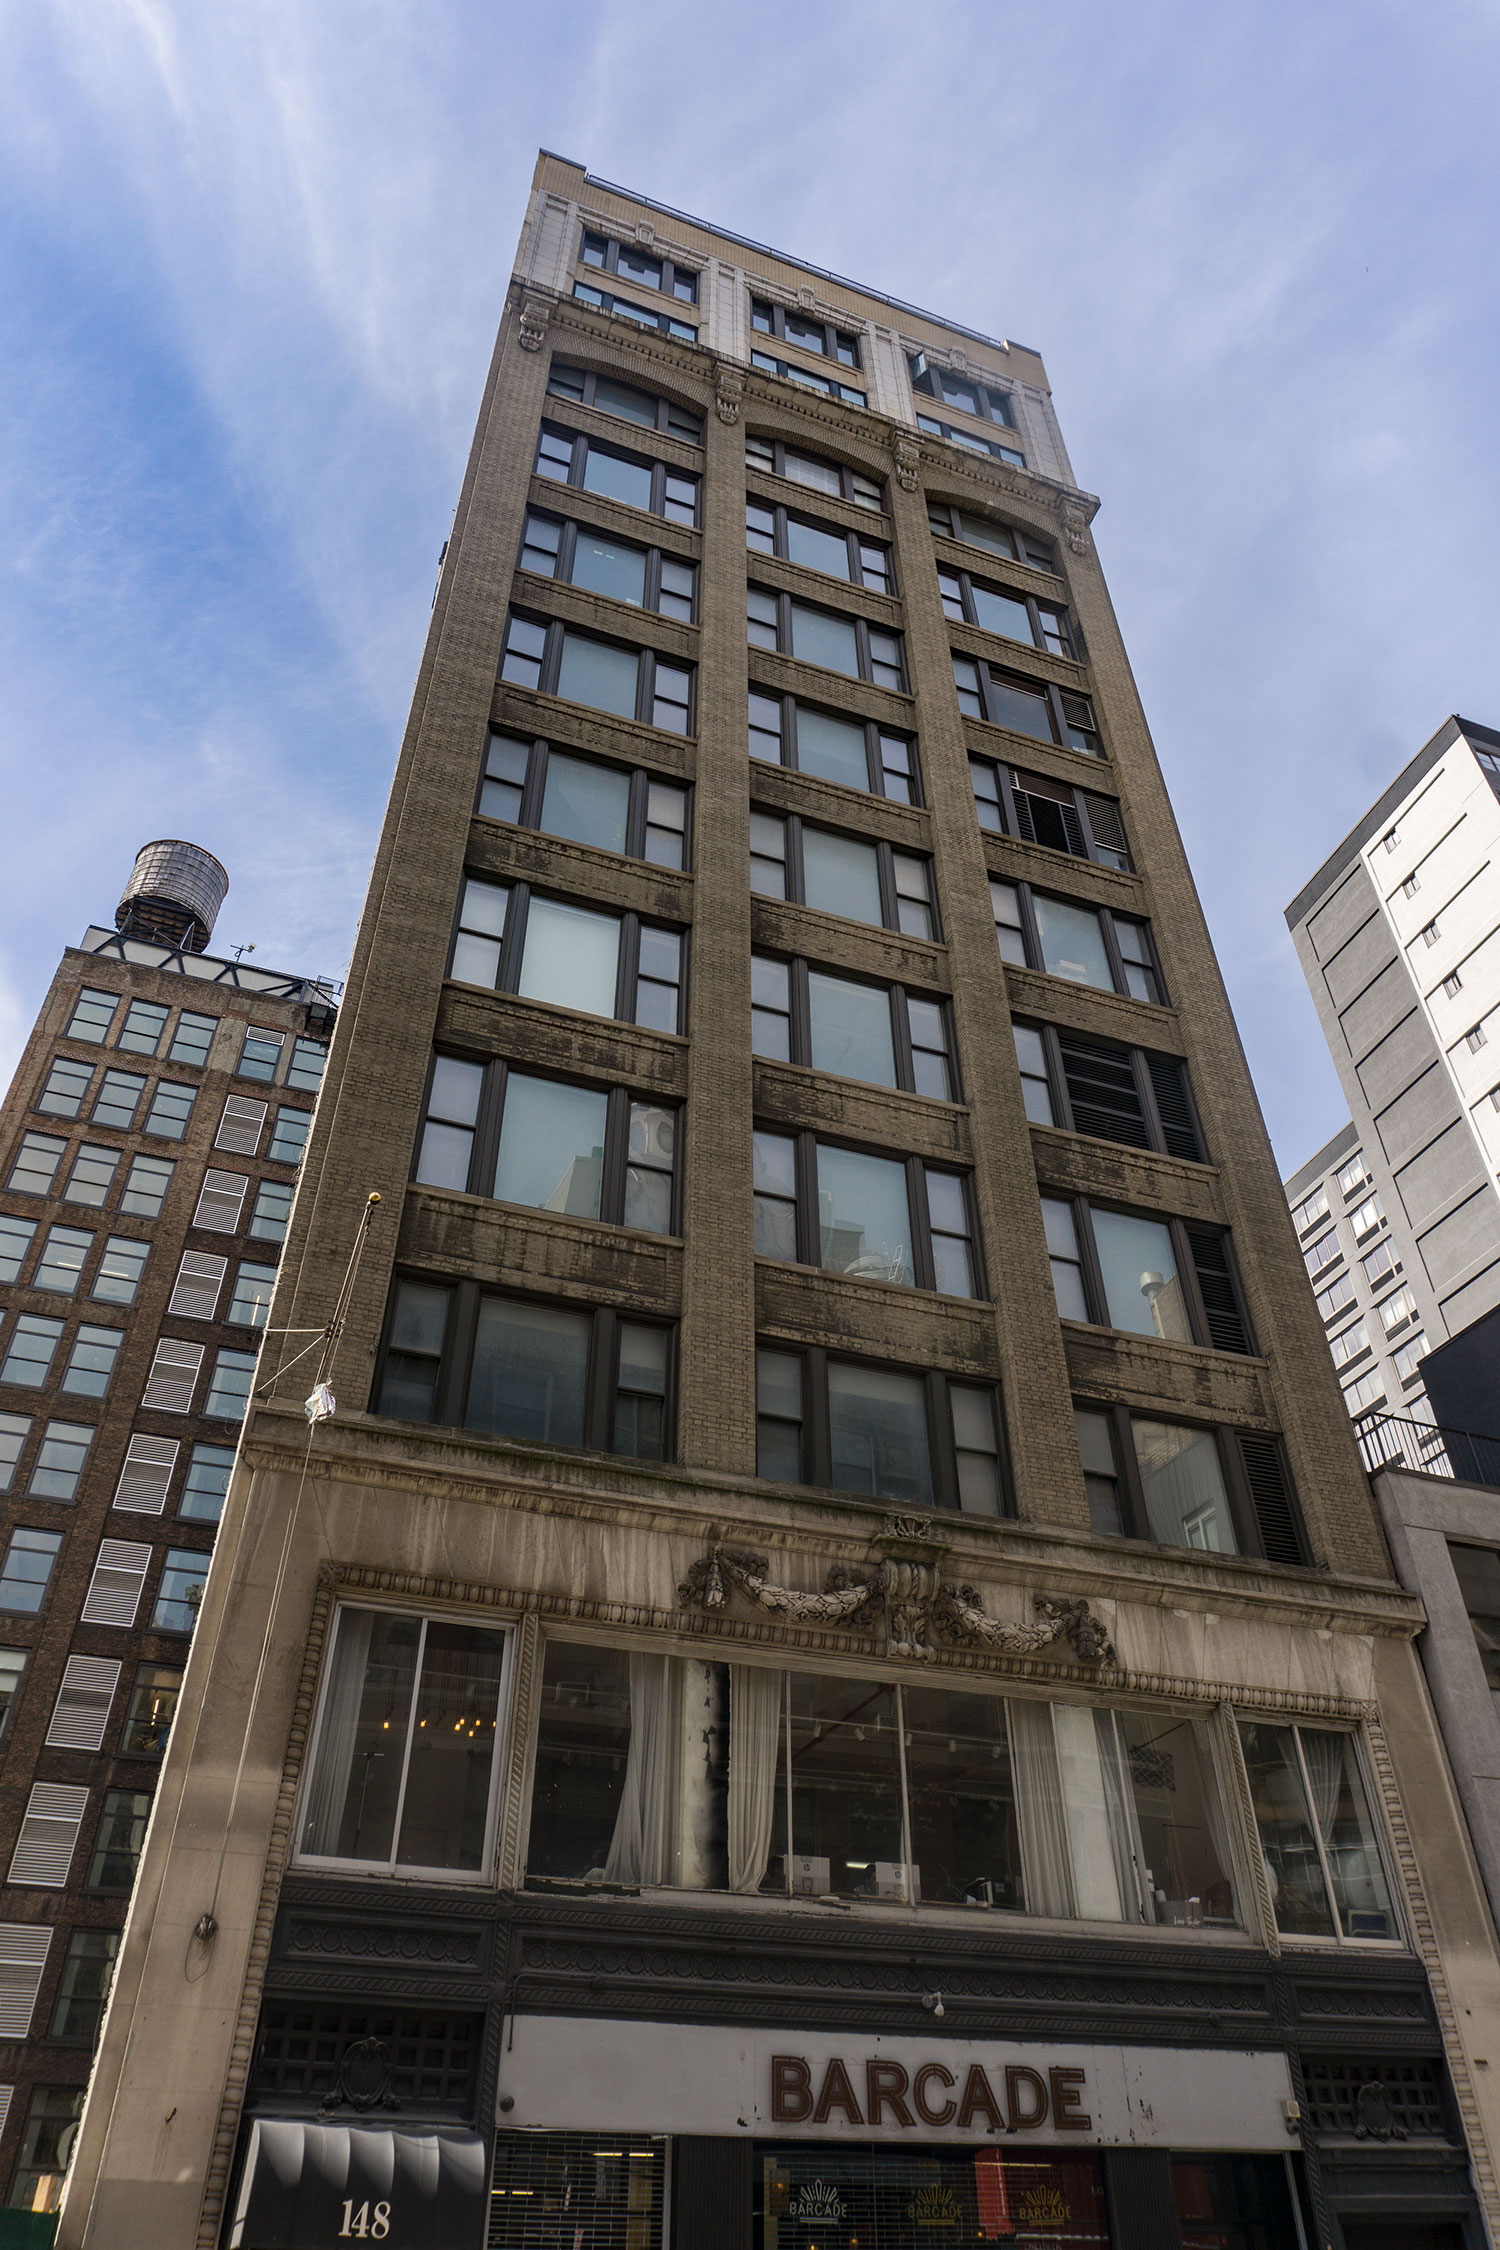 148 west 24th street -